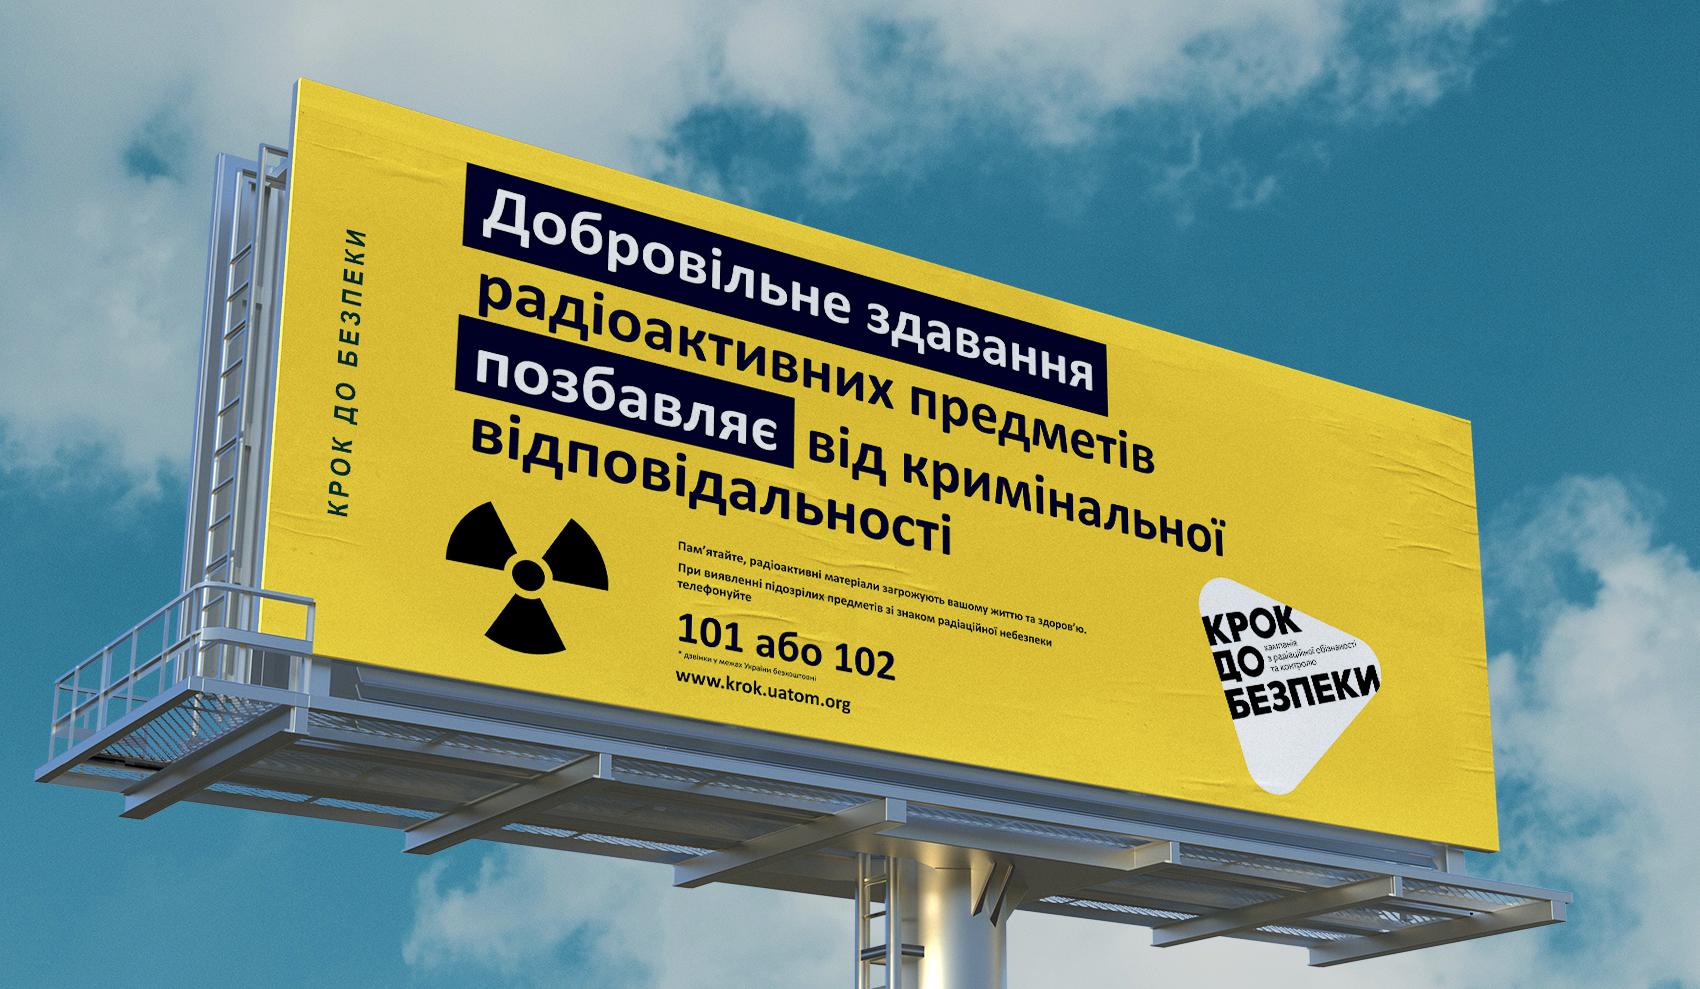 Chornobyl R&D